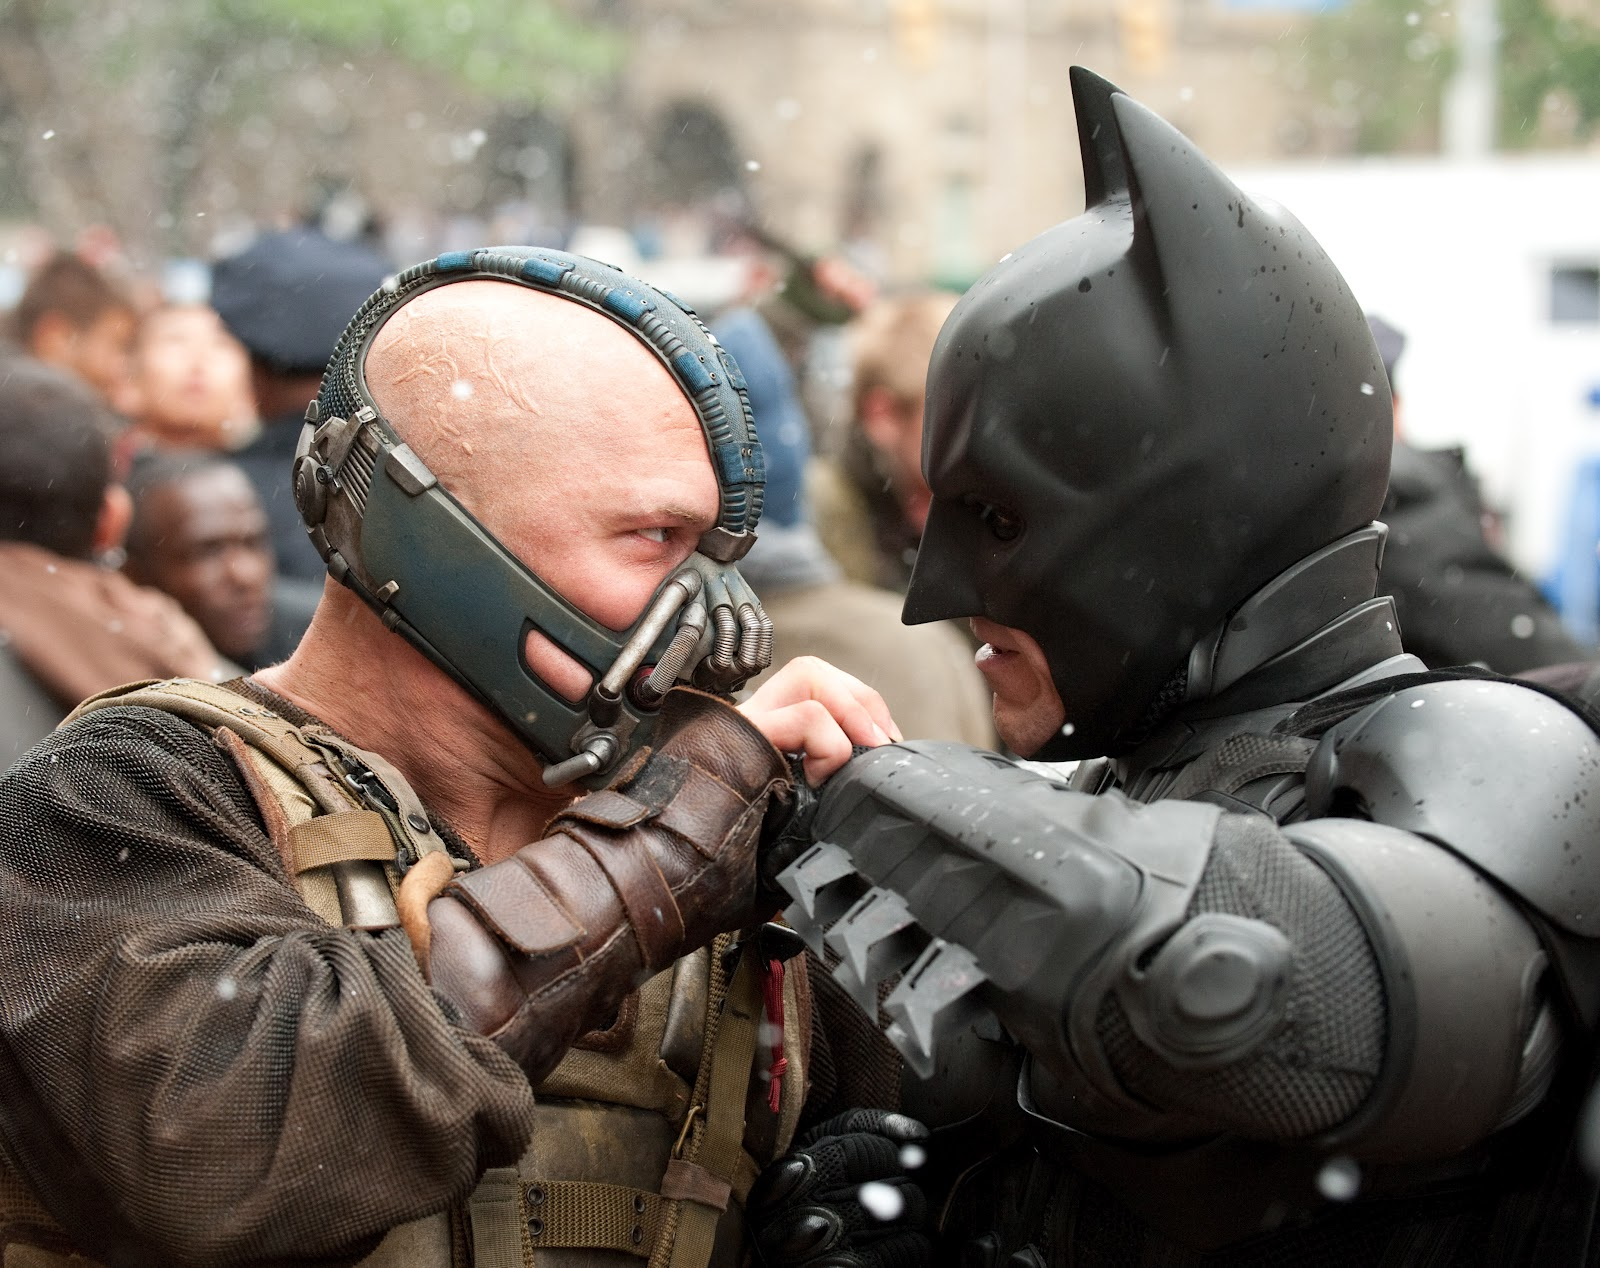 batman 3 the dark knight rises wallpapers - The Dark Knight Rises HD Wallpapers and Desktop